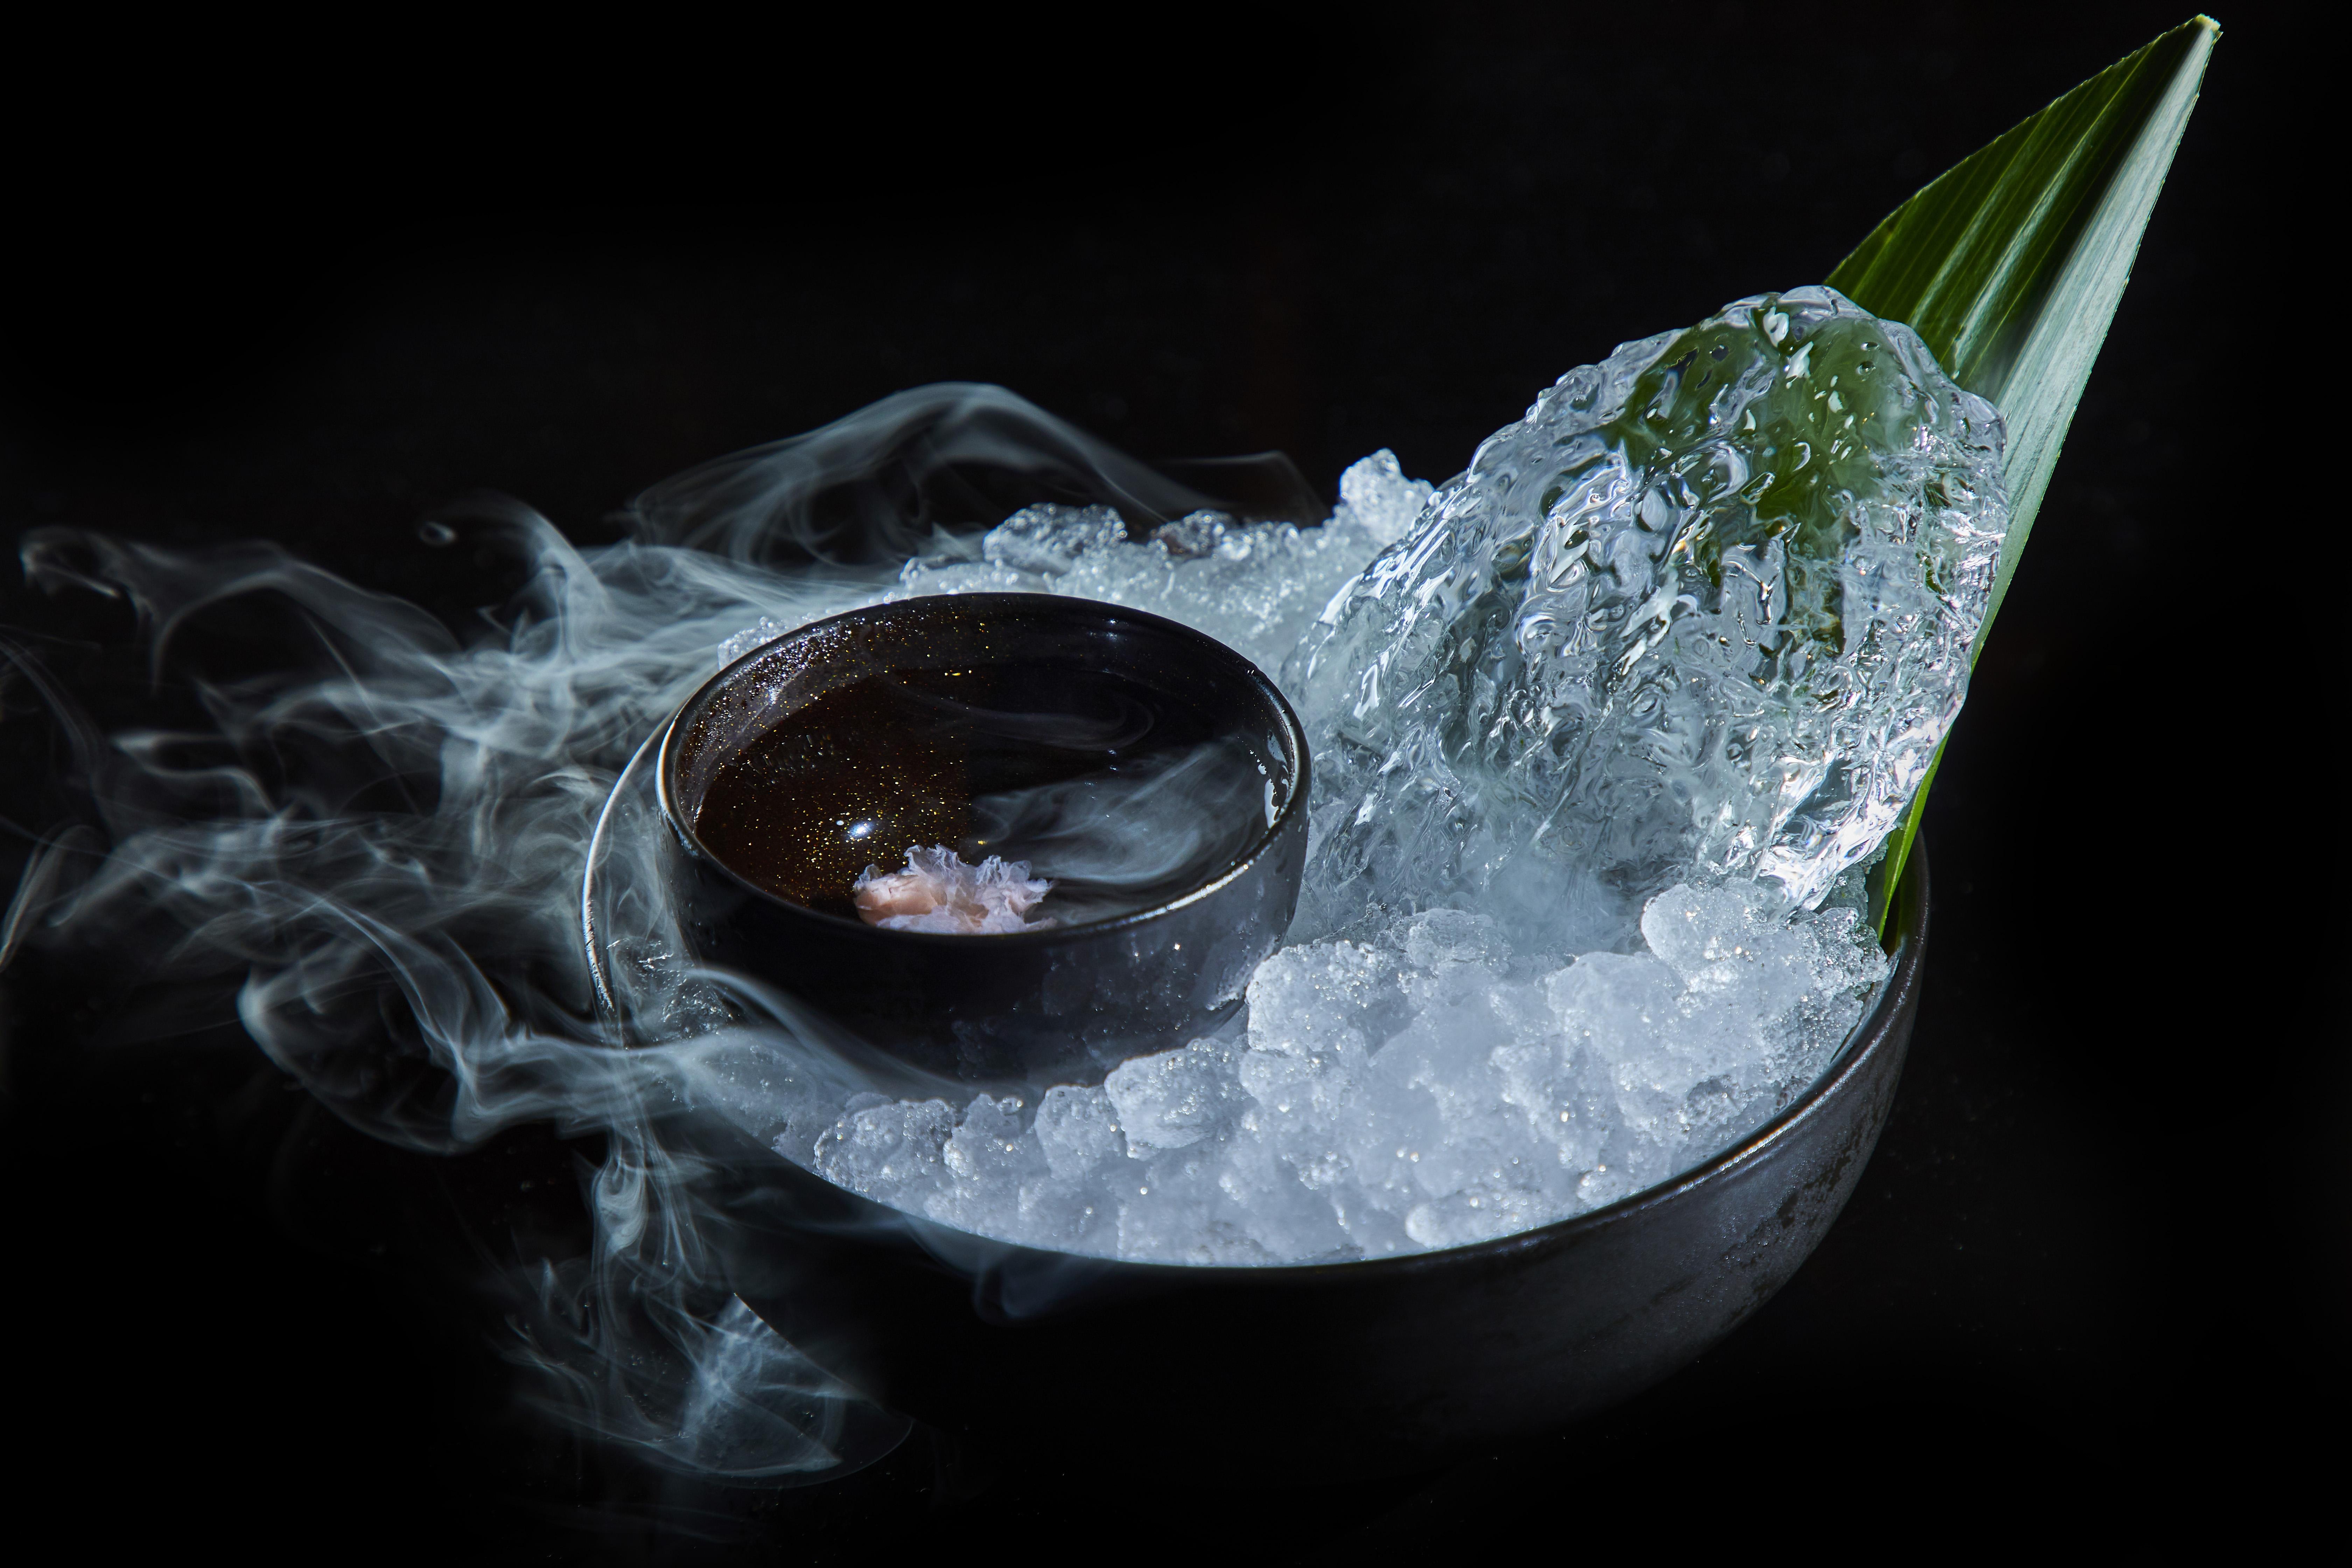 Zuma Bushido Cocktails - Hangaku Martini